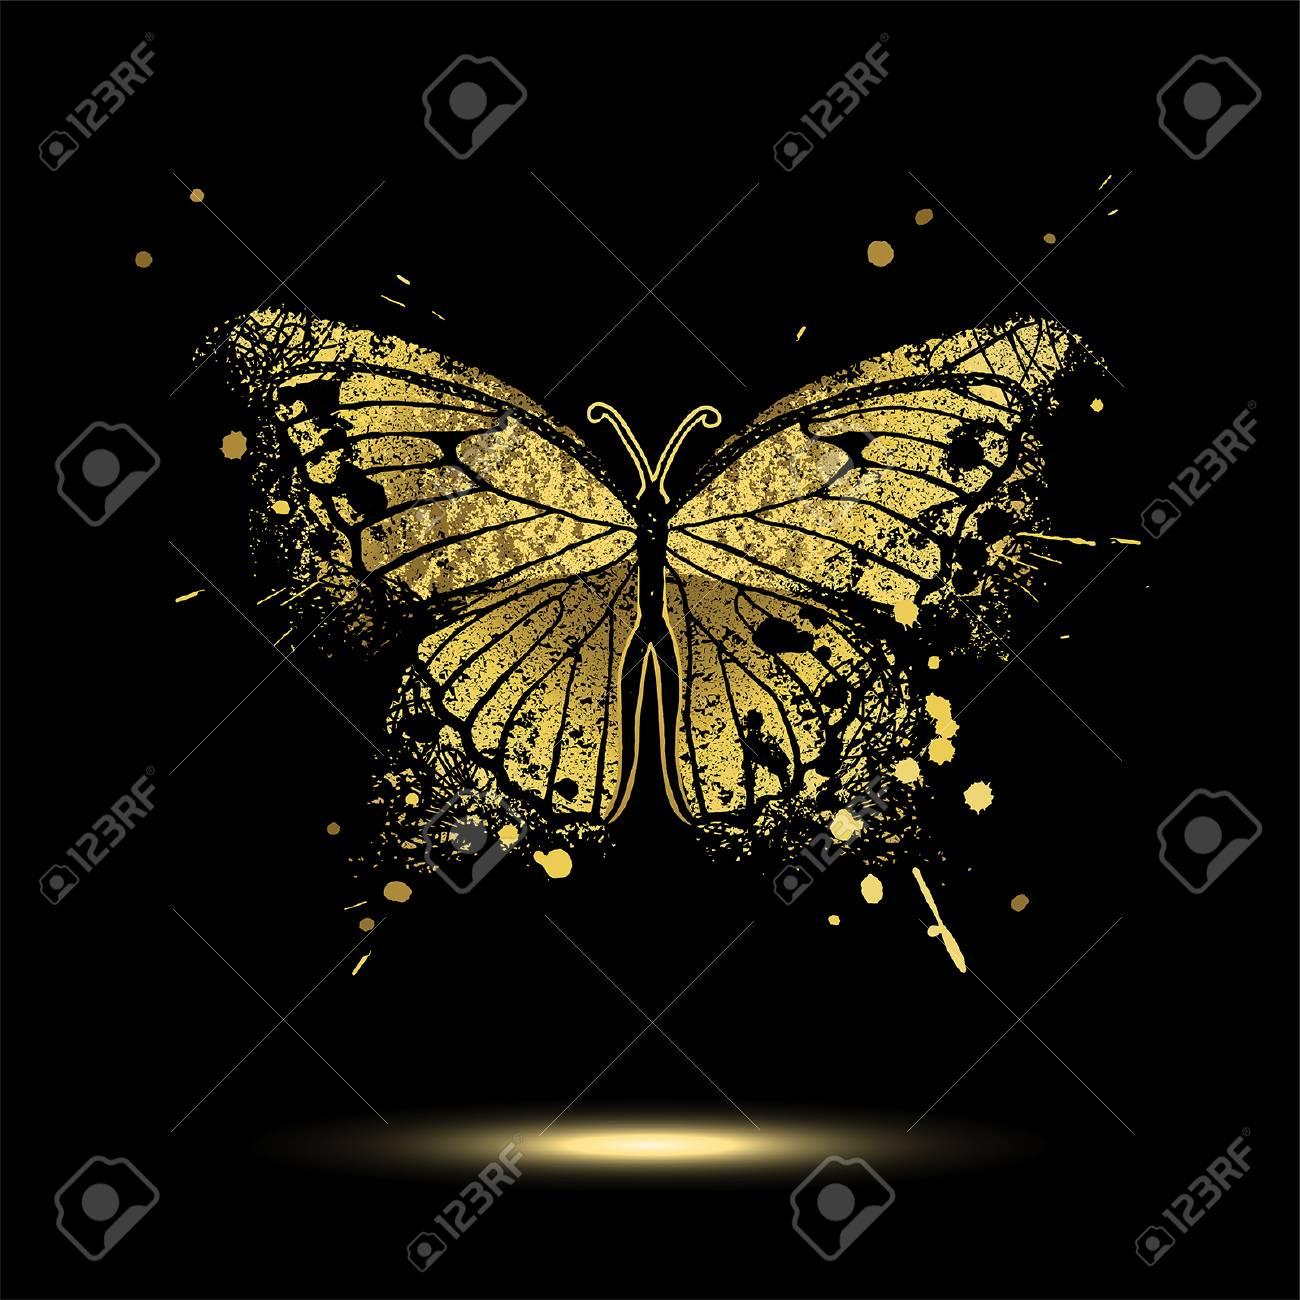 Decorative golden butterfly on a black background - 90082540